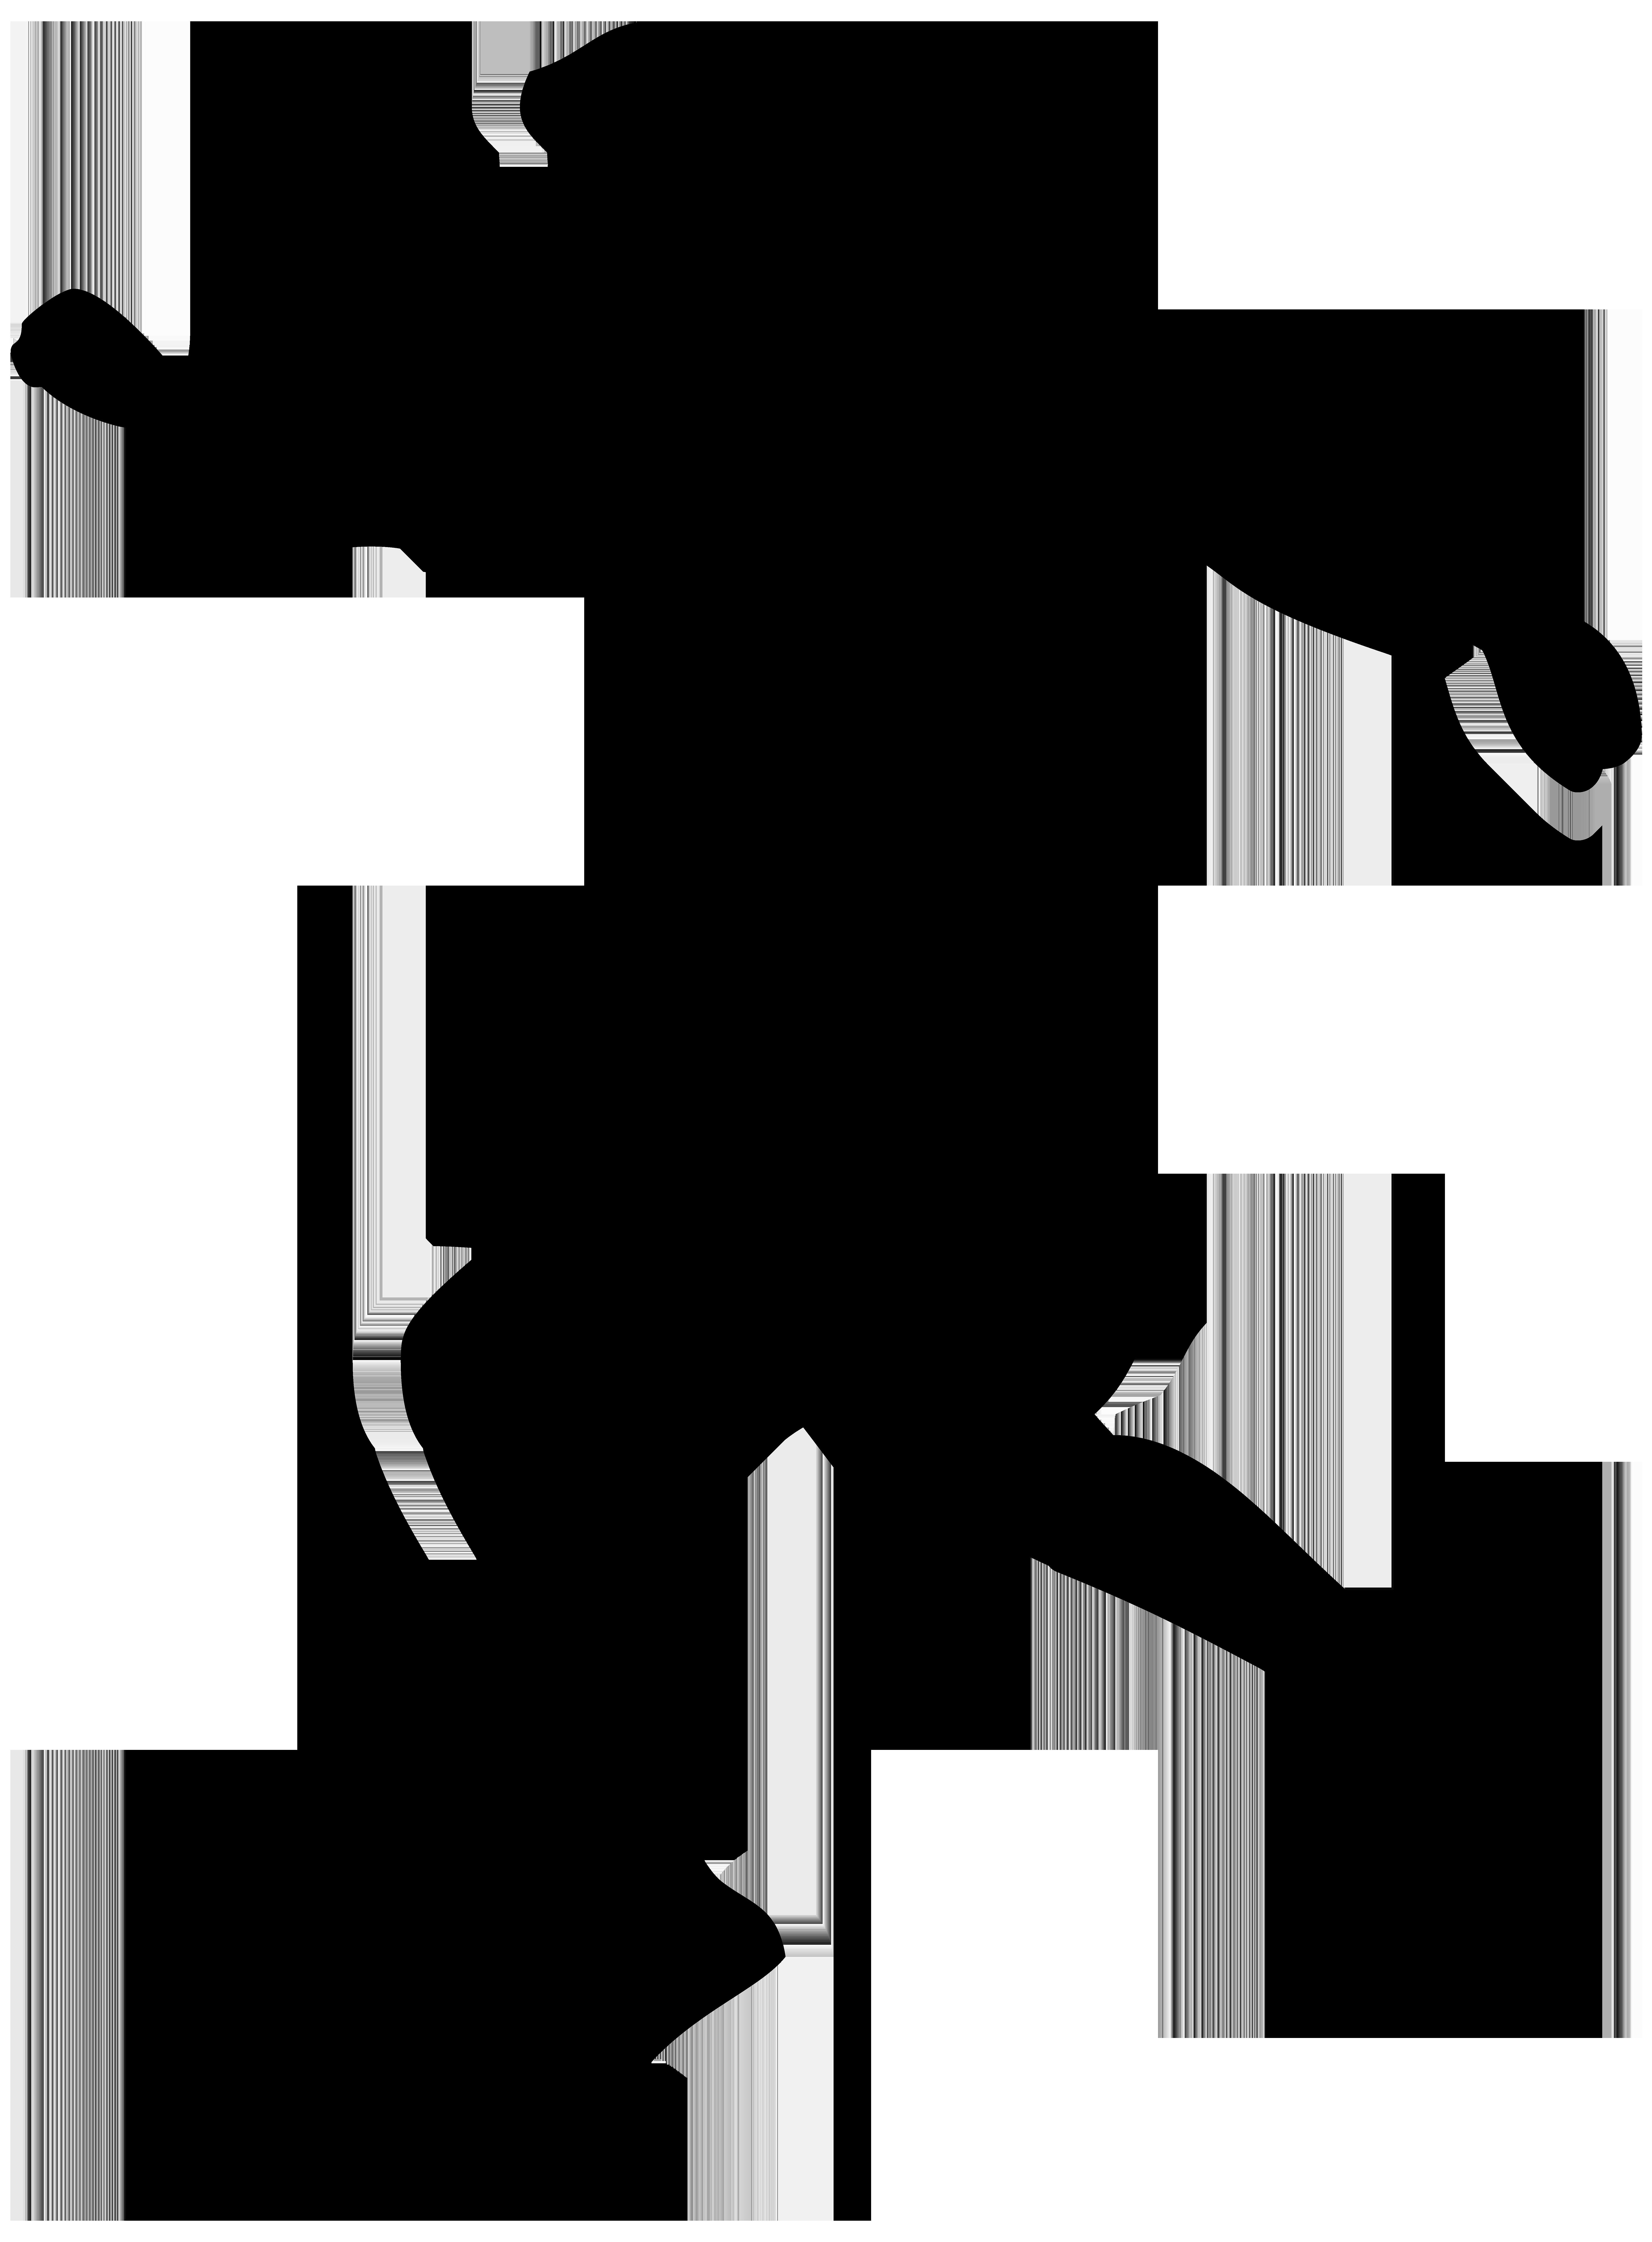 Footballer silhouette png transparent. Clipart lion soccer